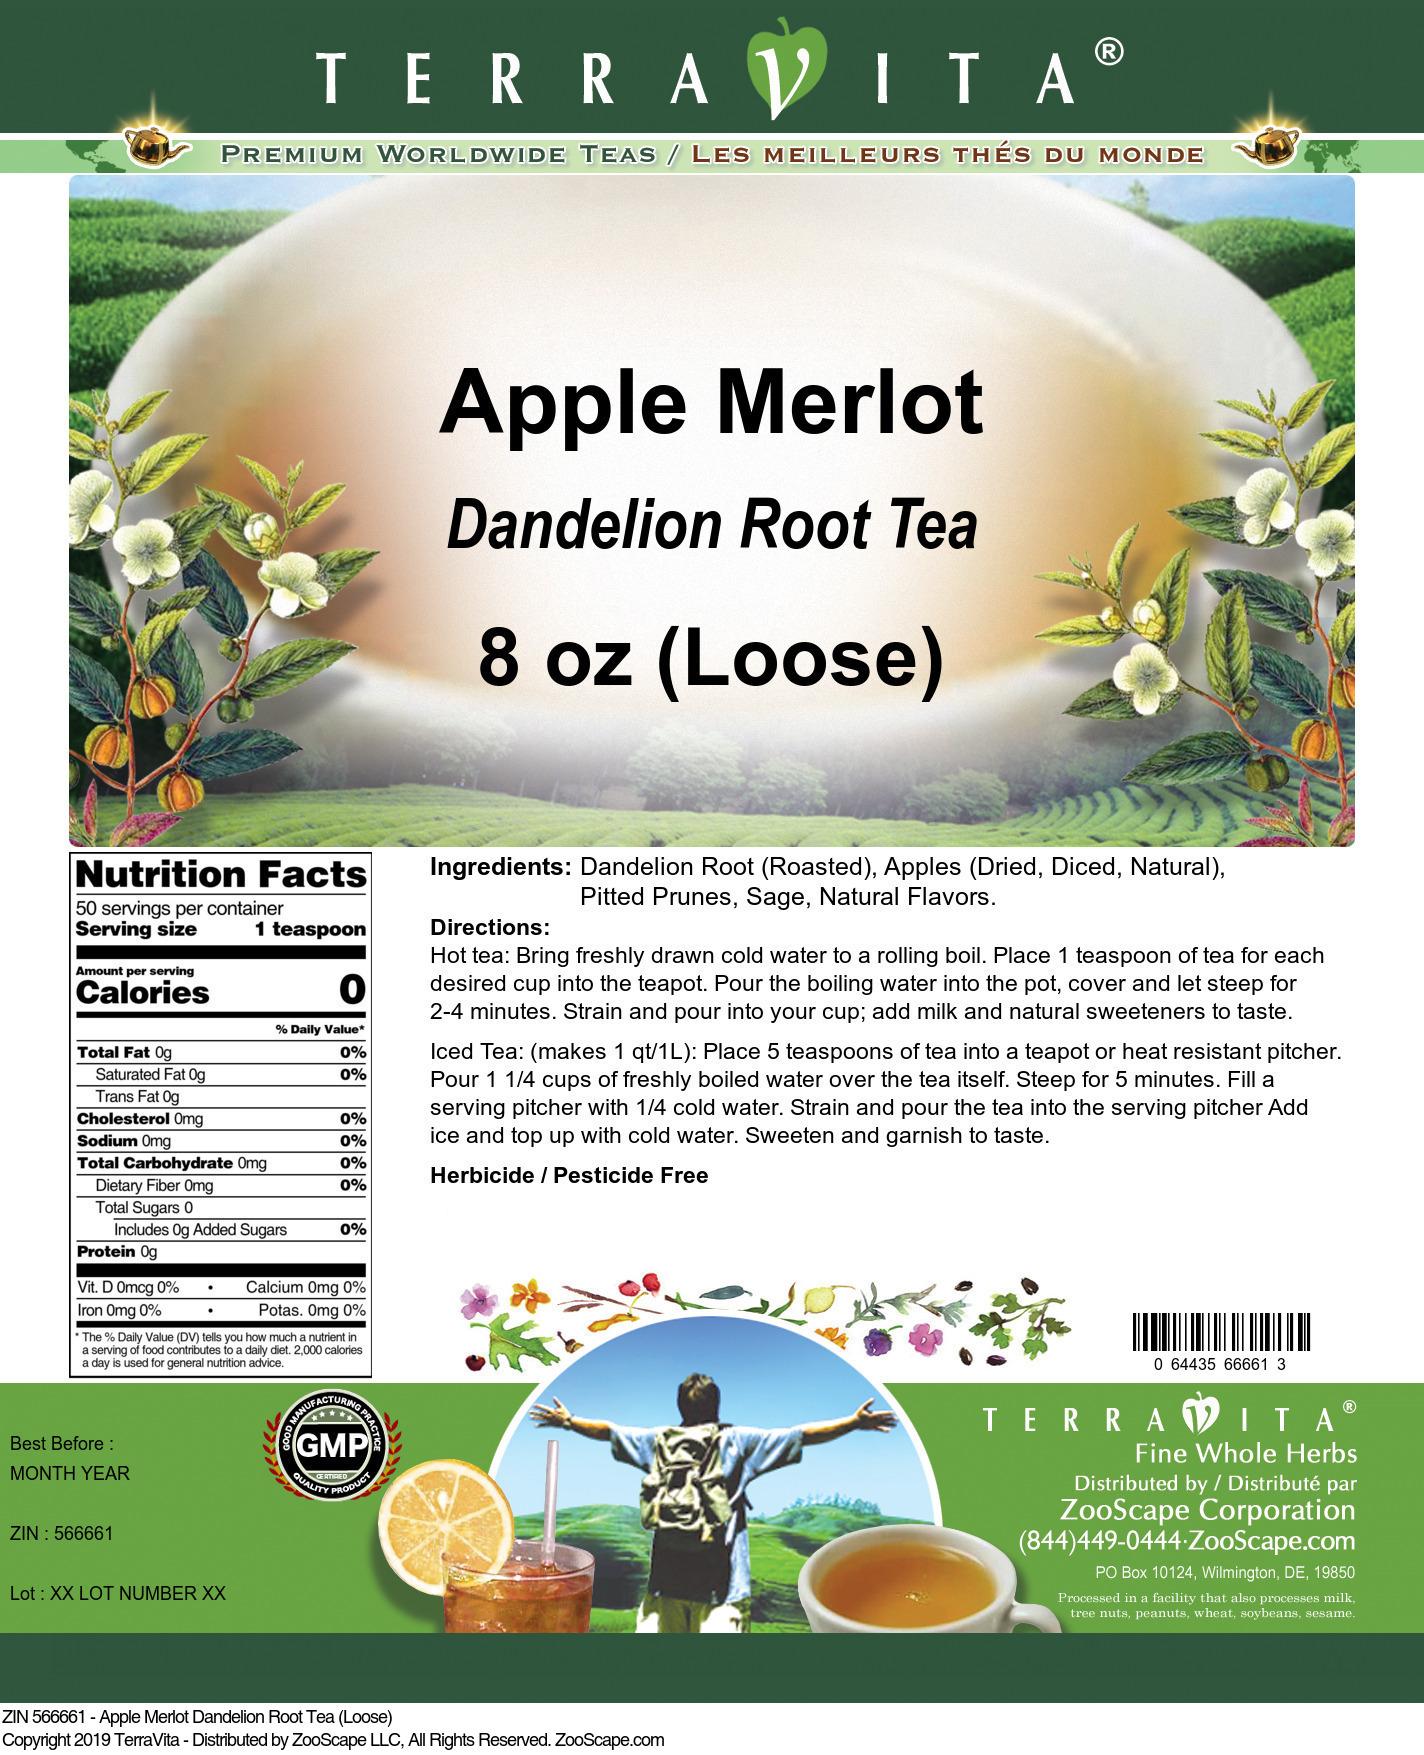 Apple Merlot Dandelion Root